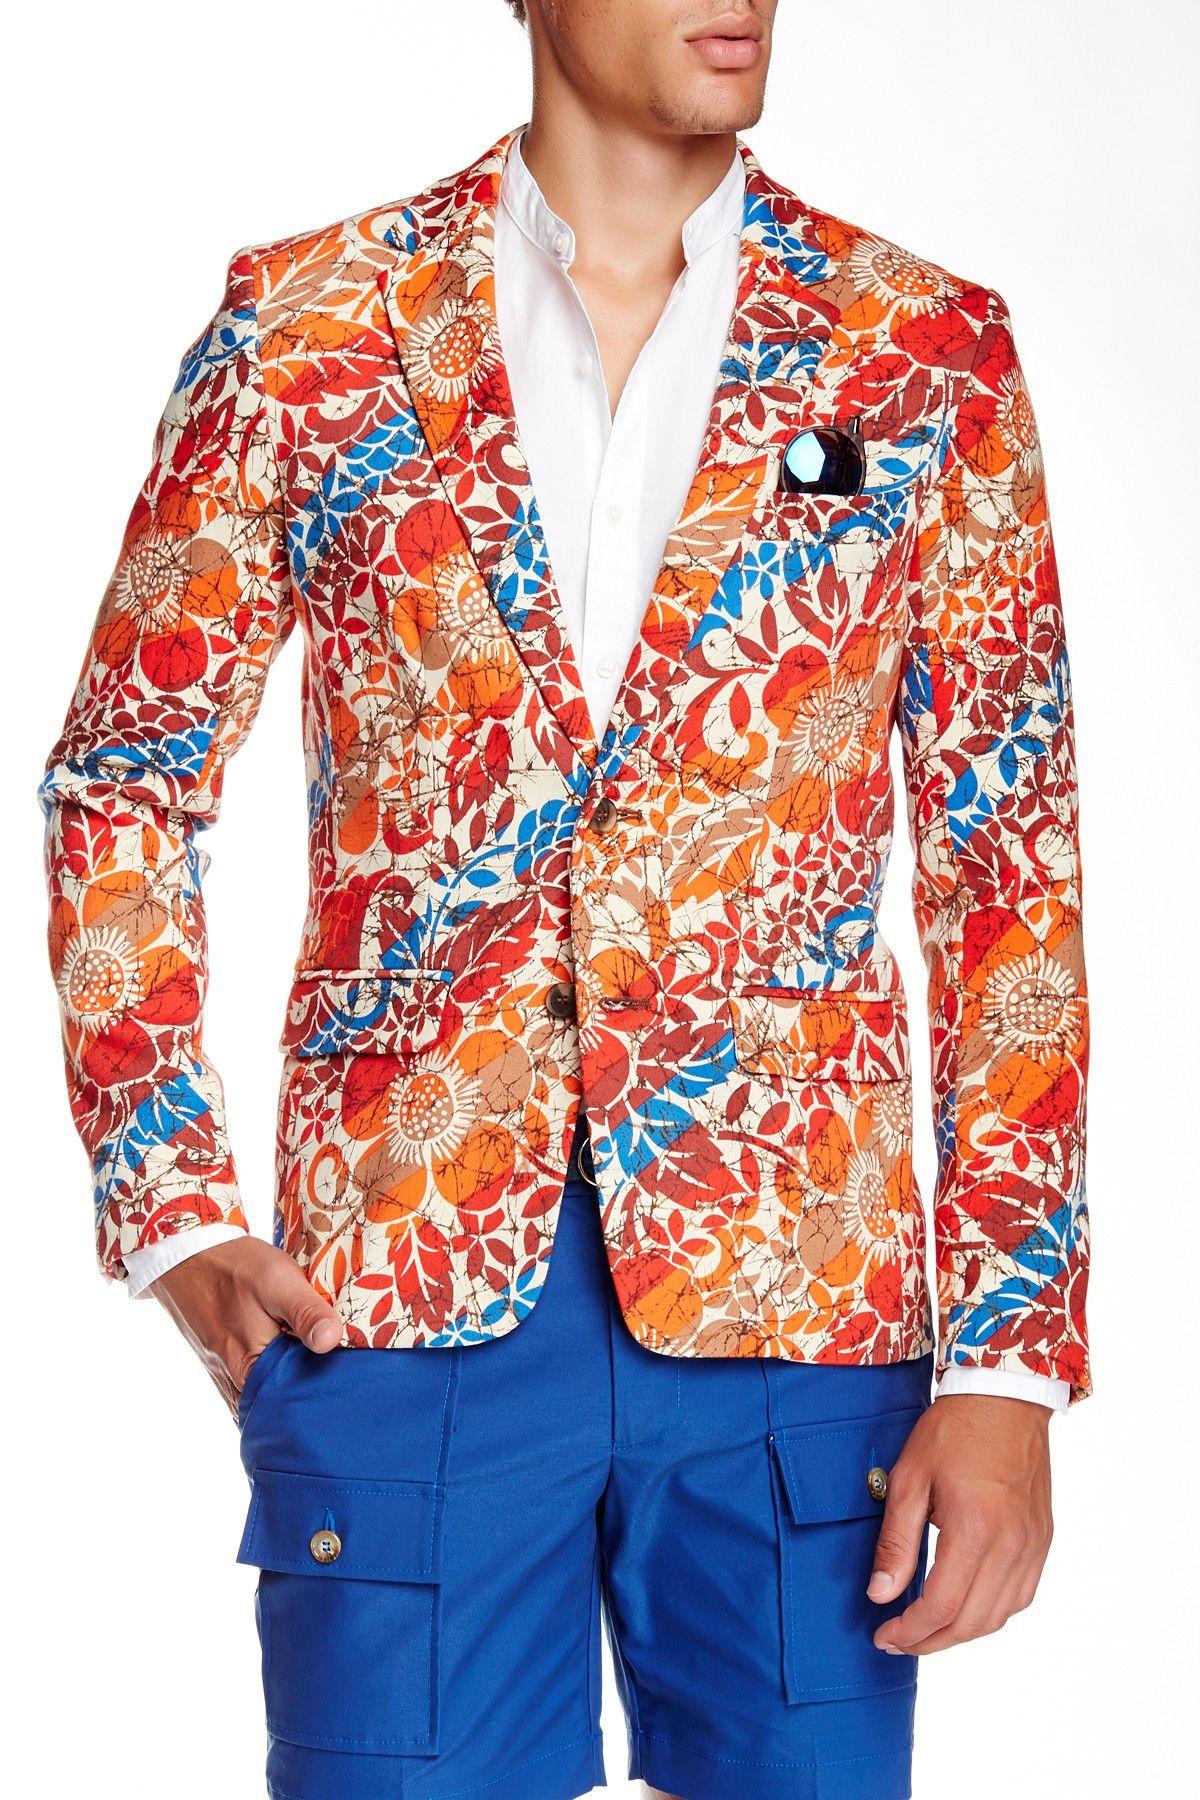 Mr.Turk Mens S/S Polka Dot Alan Shirt Orange - Shirts & Tops